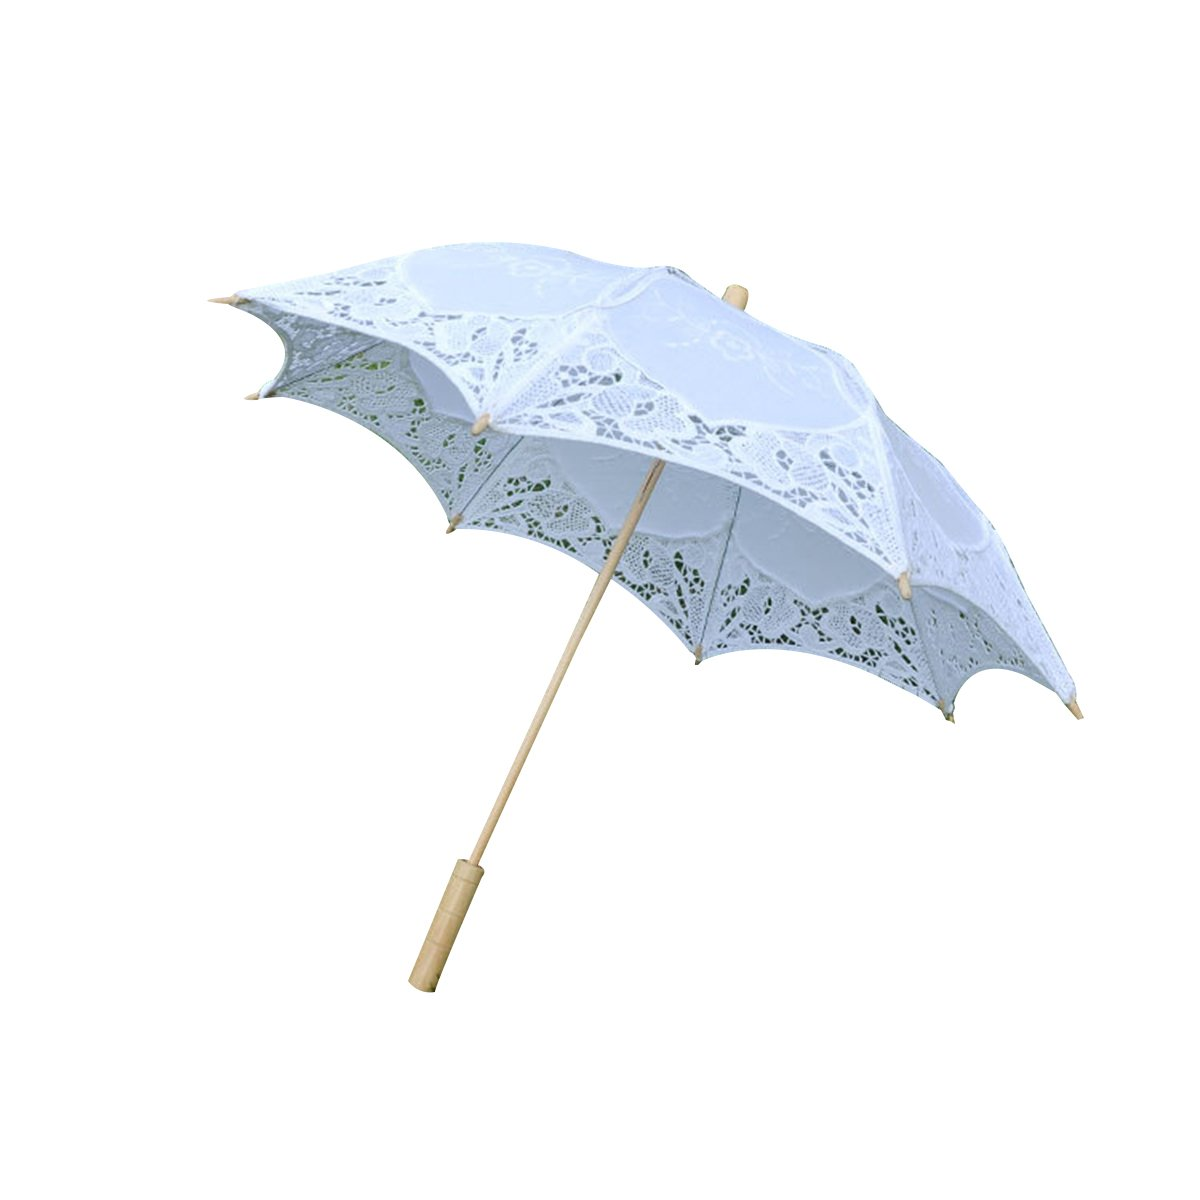 BESTOYARD Bridal Wedding Umbrella Lace Cotton Embroidery Handmade Parasol Umbrella for Wedding (White)